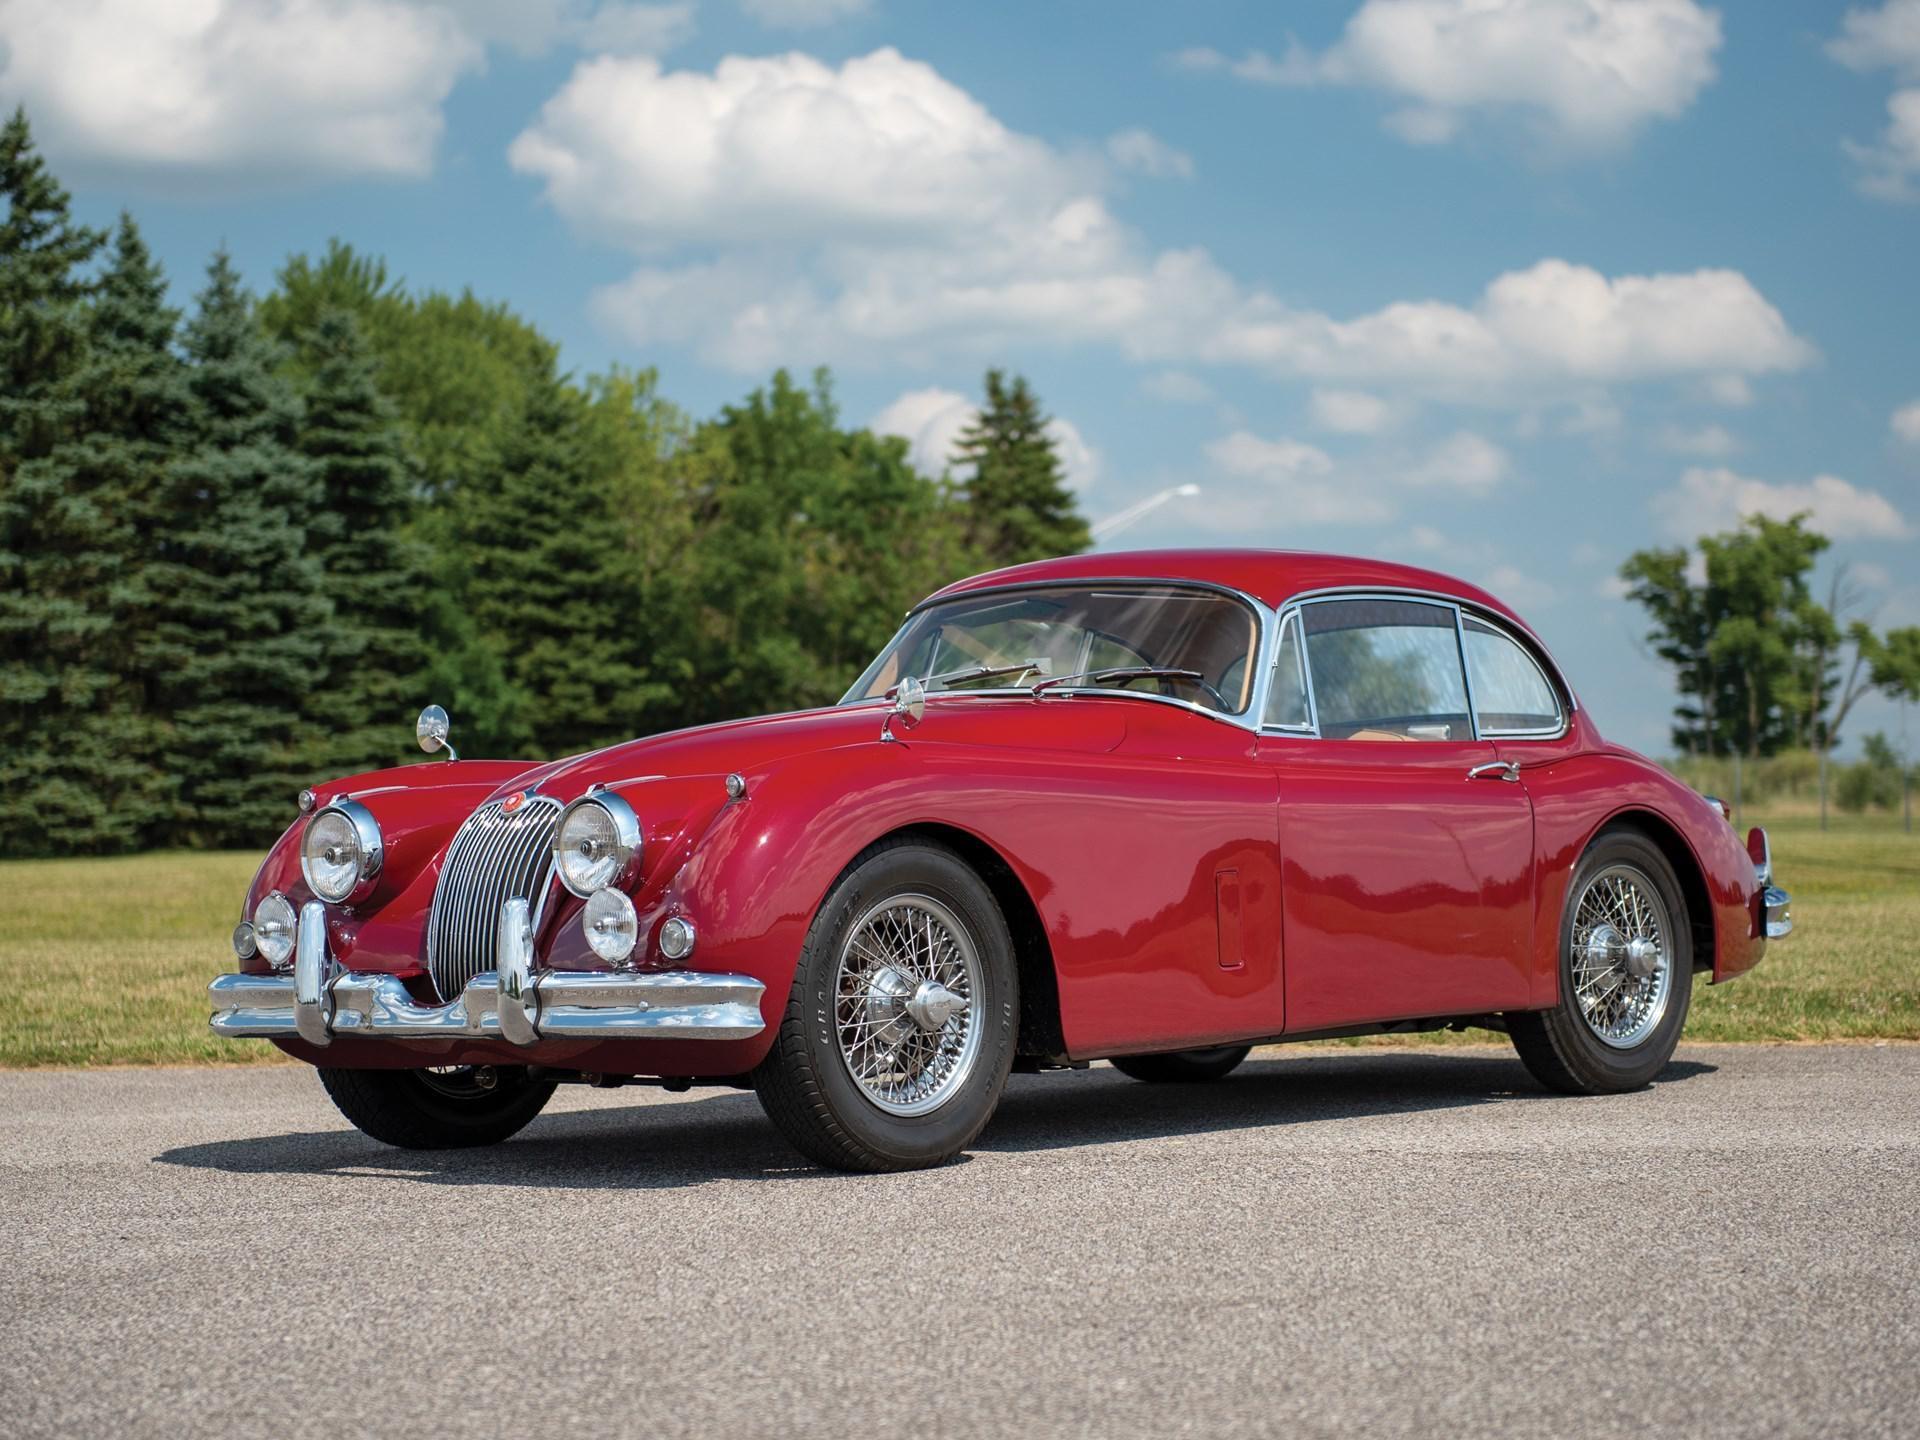 1958 Jaguar XK 150 Fixed Head Coupe